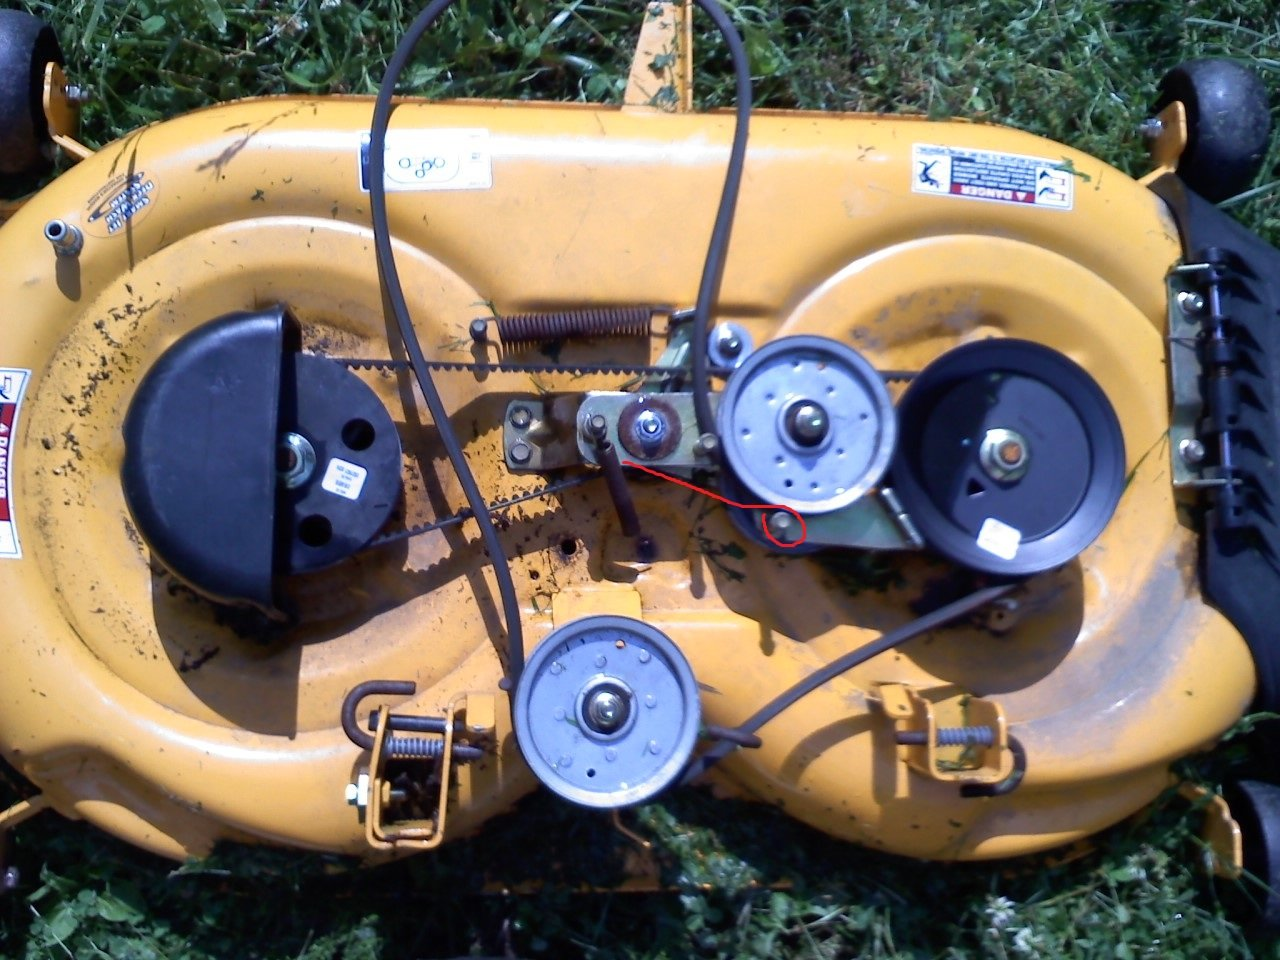 Craftsman Riding Mower Deck Belt Diagram also Iplimage furthermore Bg D also Hqdefault likewise Iplimage. on cub cadet mower deck belt diagram